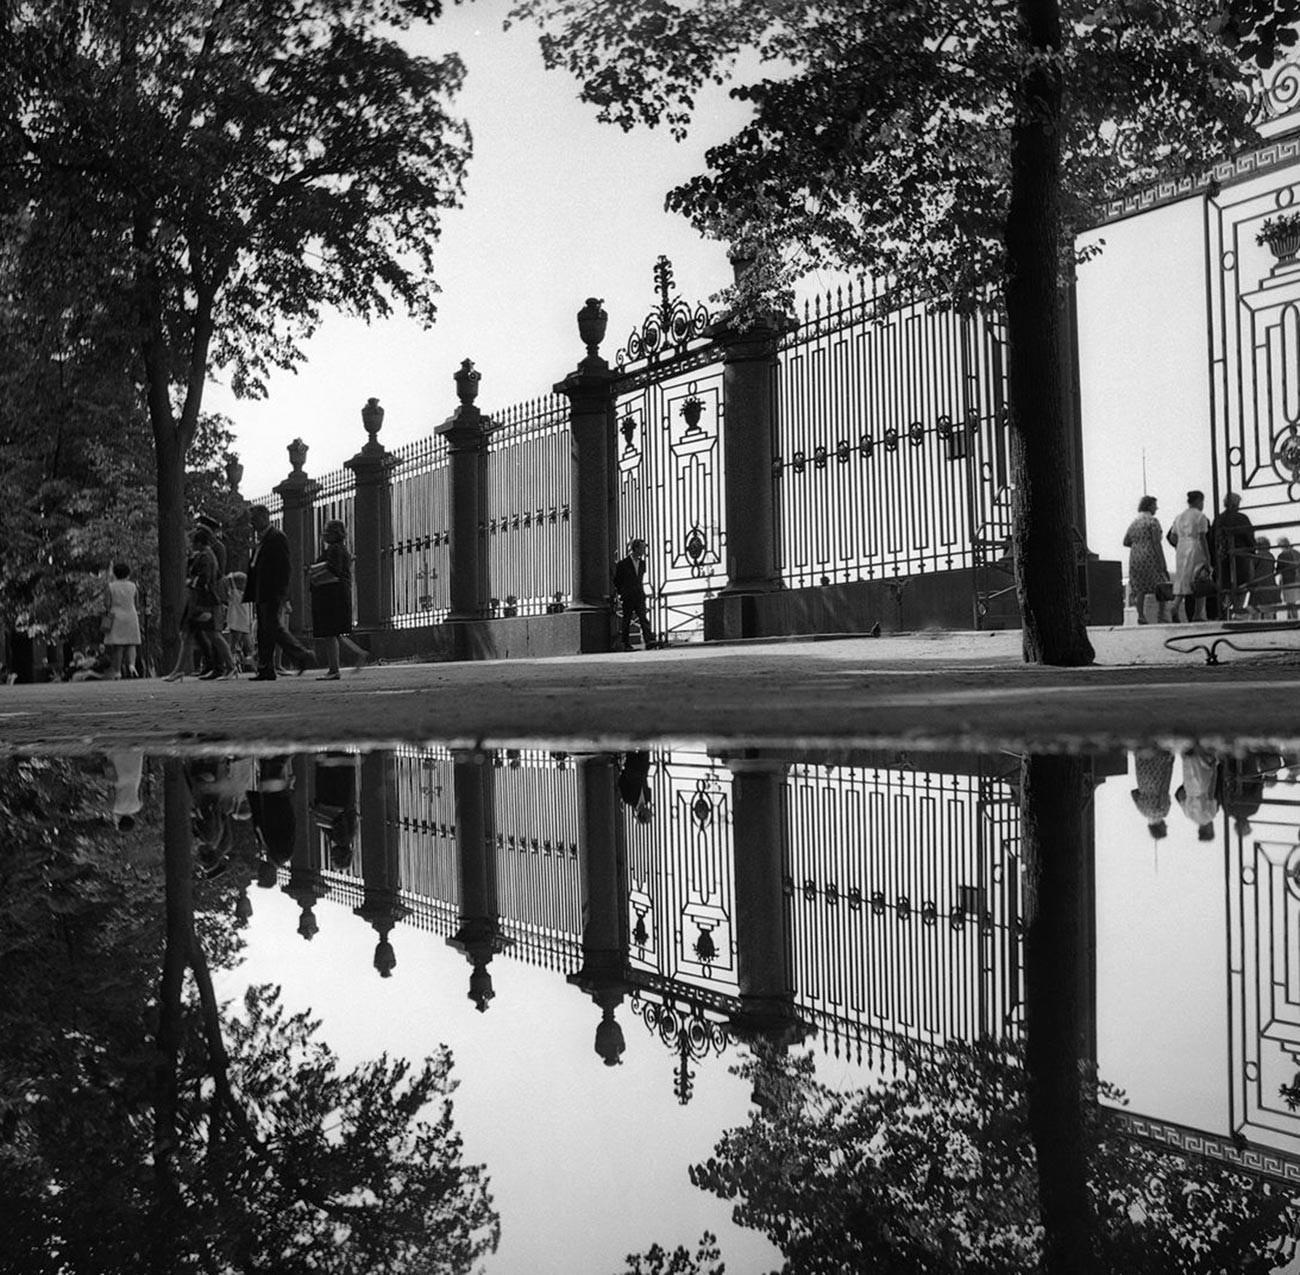 Jardin d'été, 1970